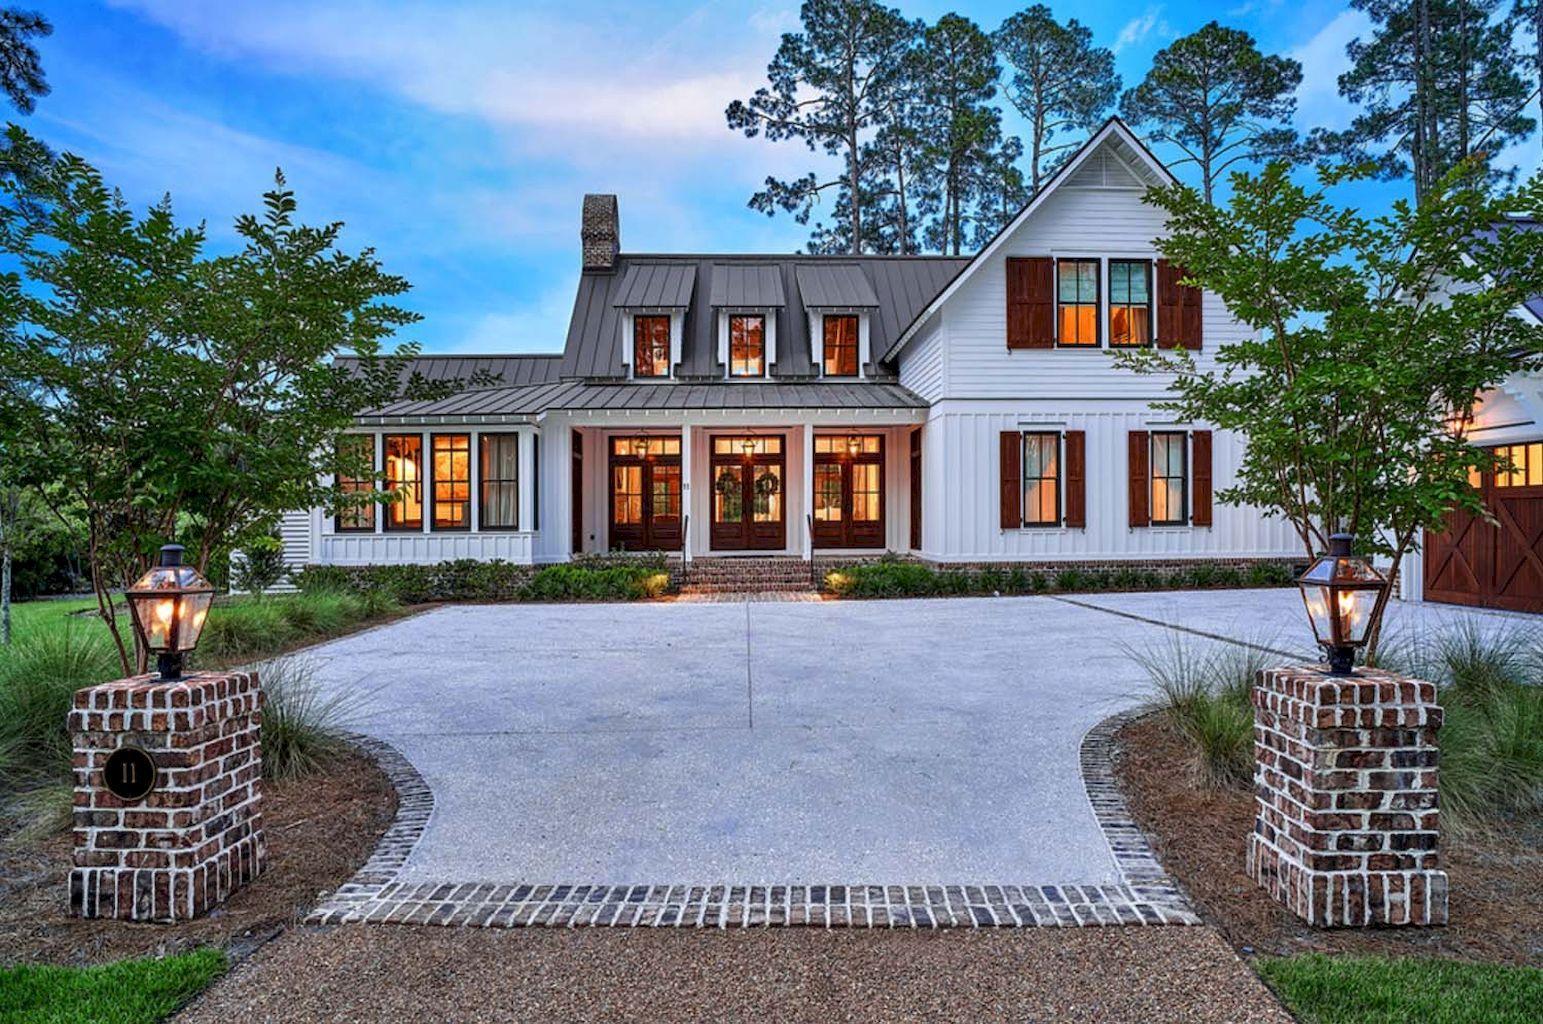 70 stunning farmhouse exterior design ideas (27 | exterior design